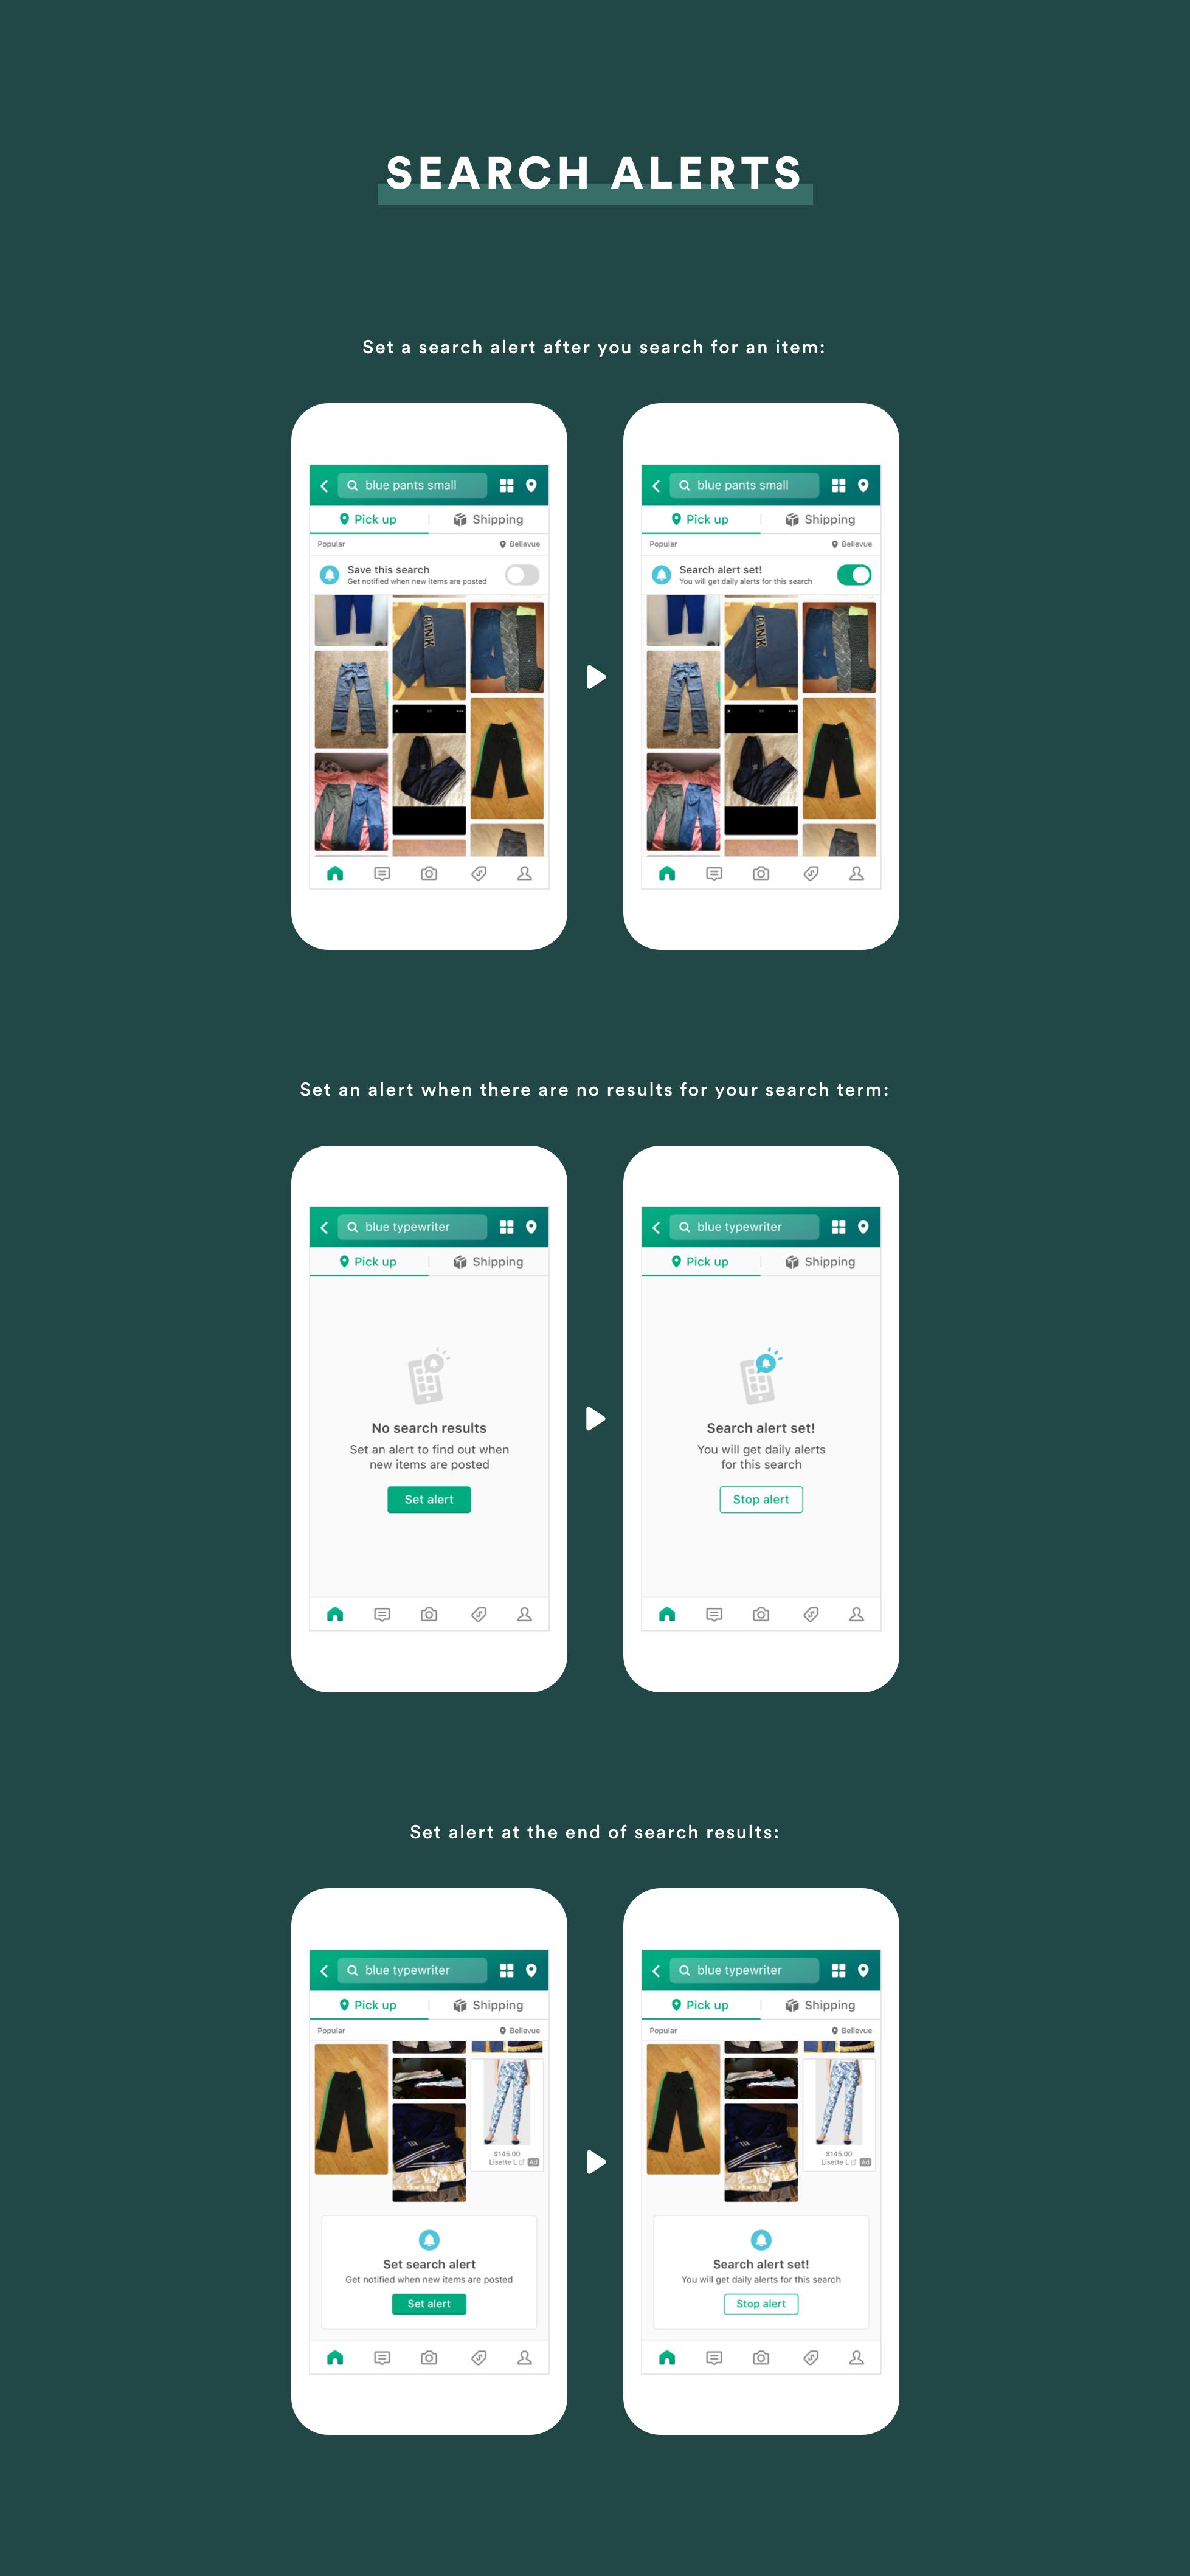 Minna So UX Designer OfferUp Search Alerts